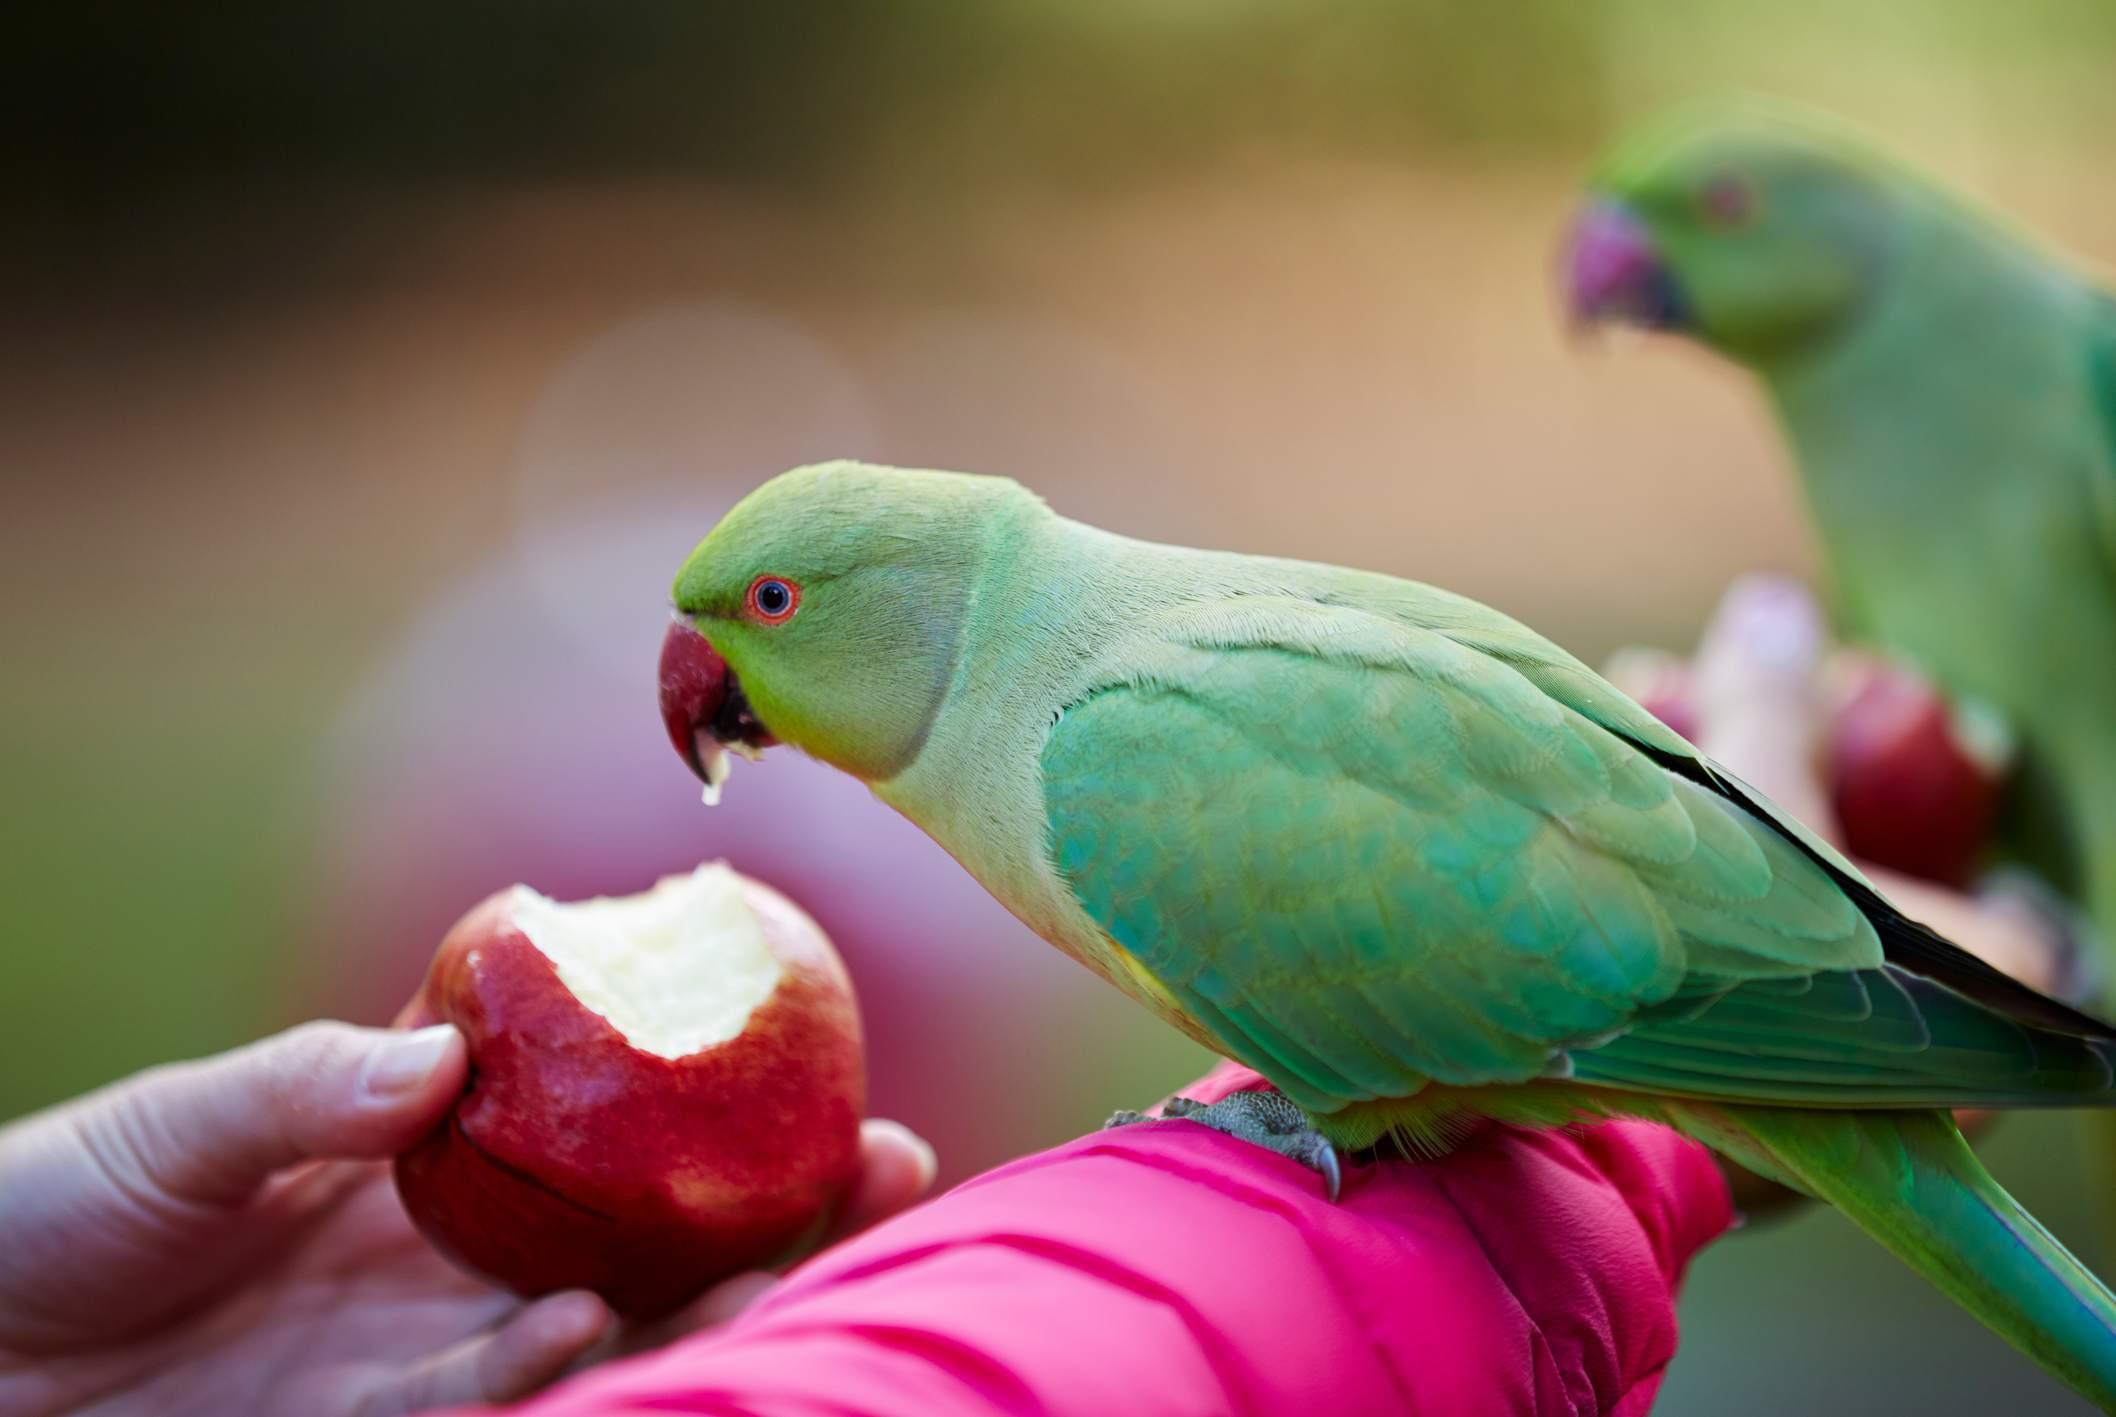 Feeding parrot an apple